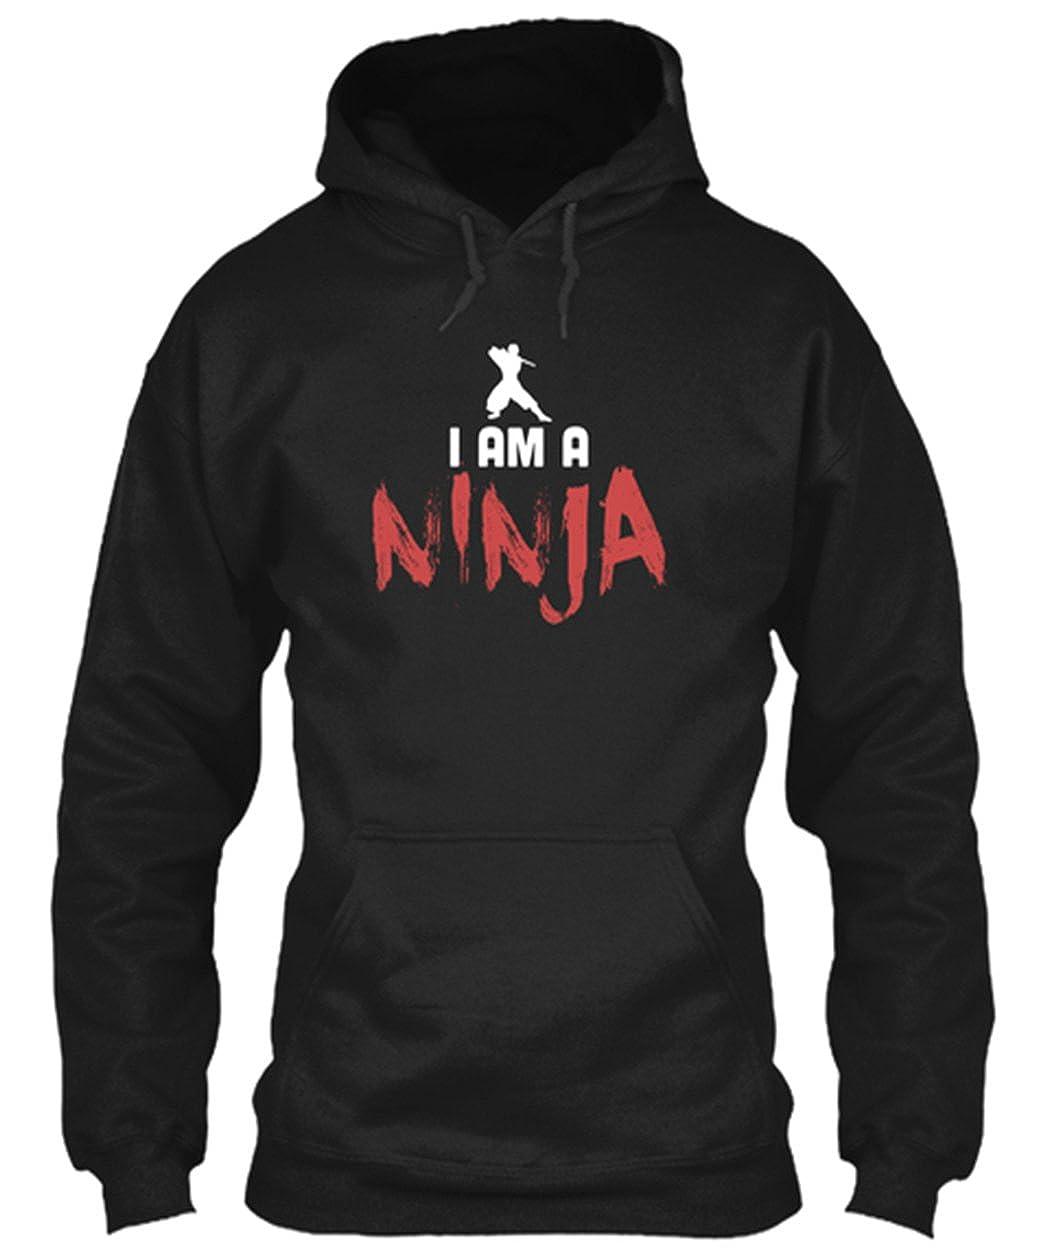 Amazon.com: Total Basics Ninja - Ninja, Japan Premium Black ...